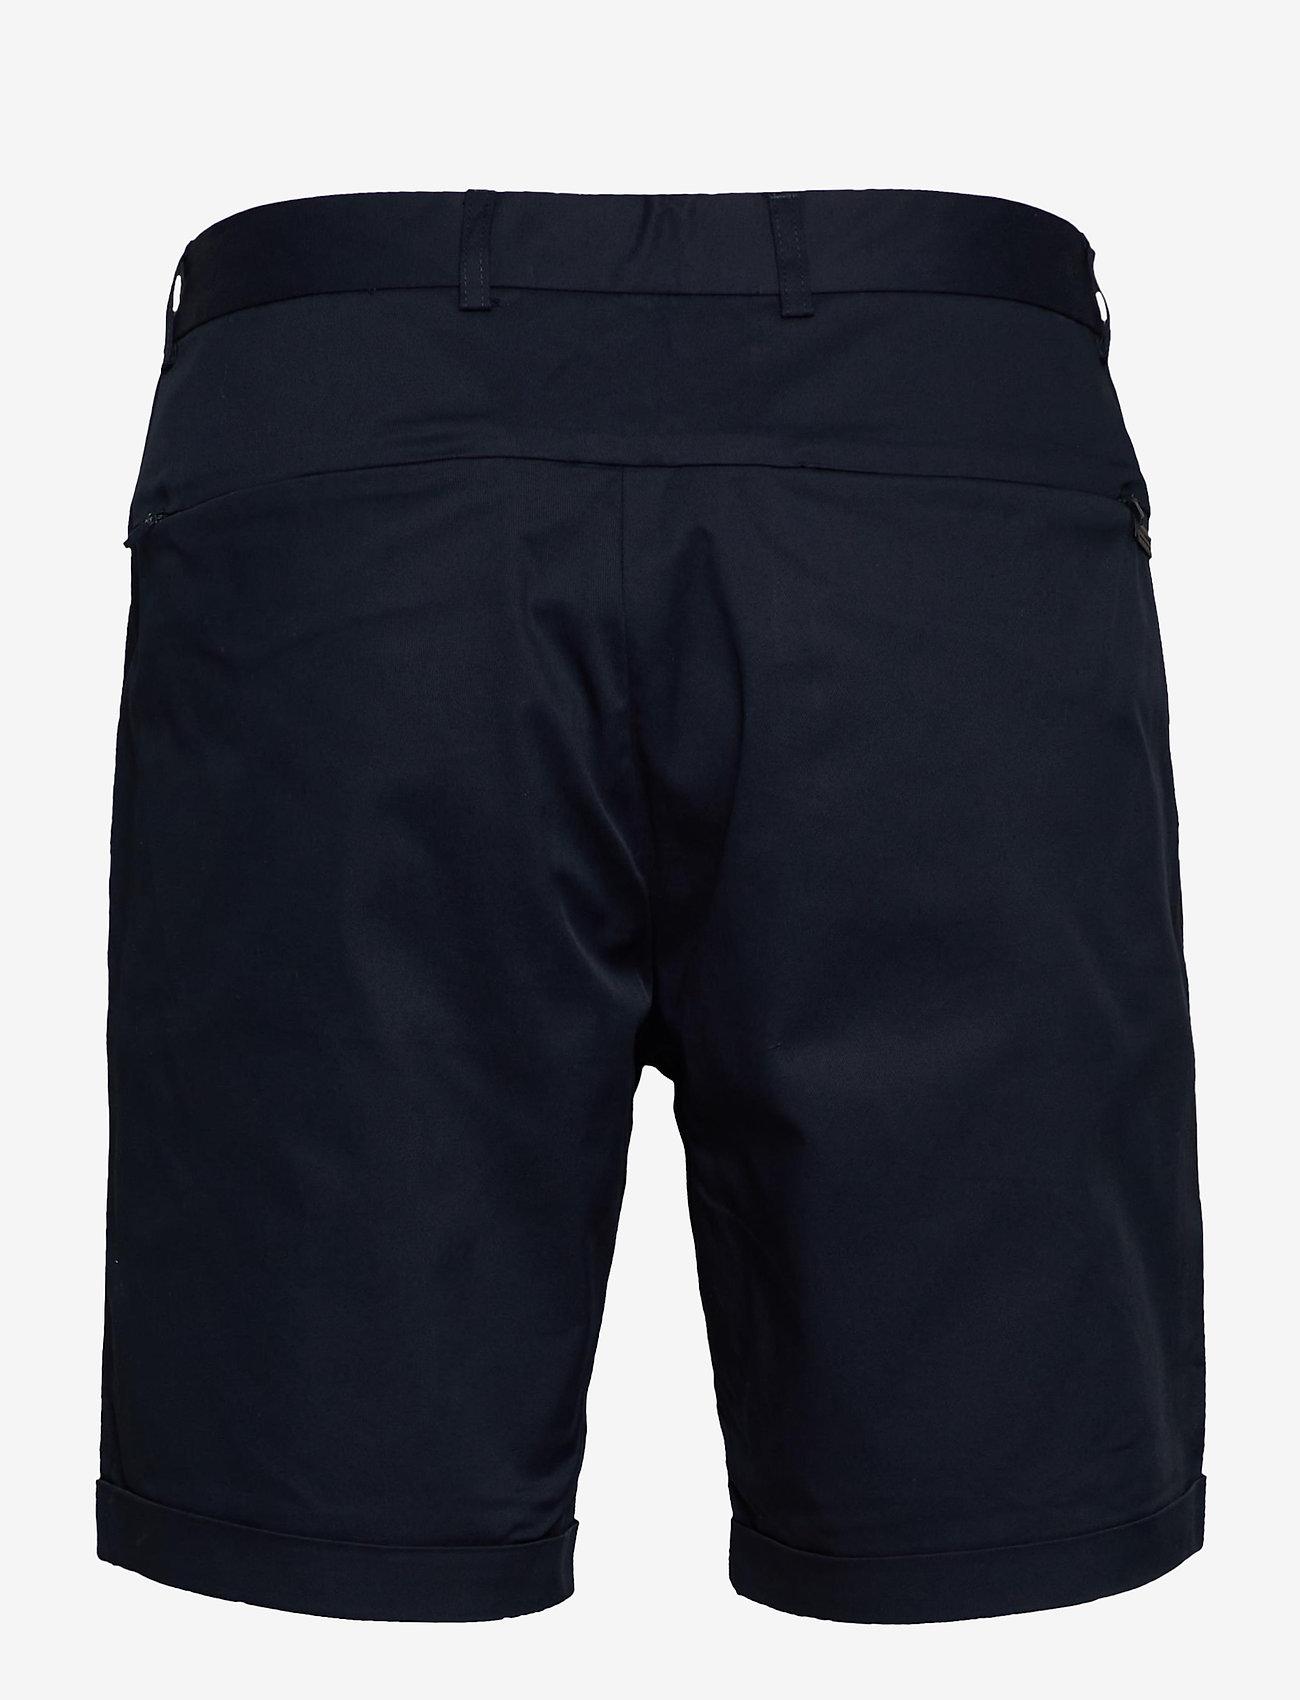 Scotch & Soda - City beach short - chinos shorts - night - 1